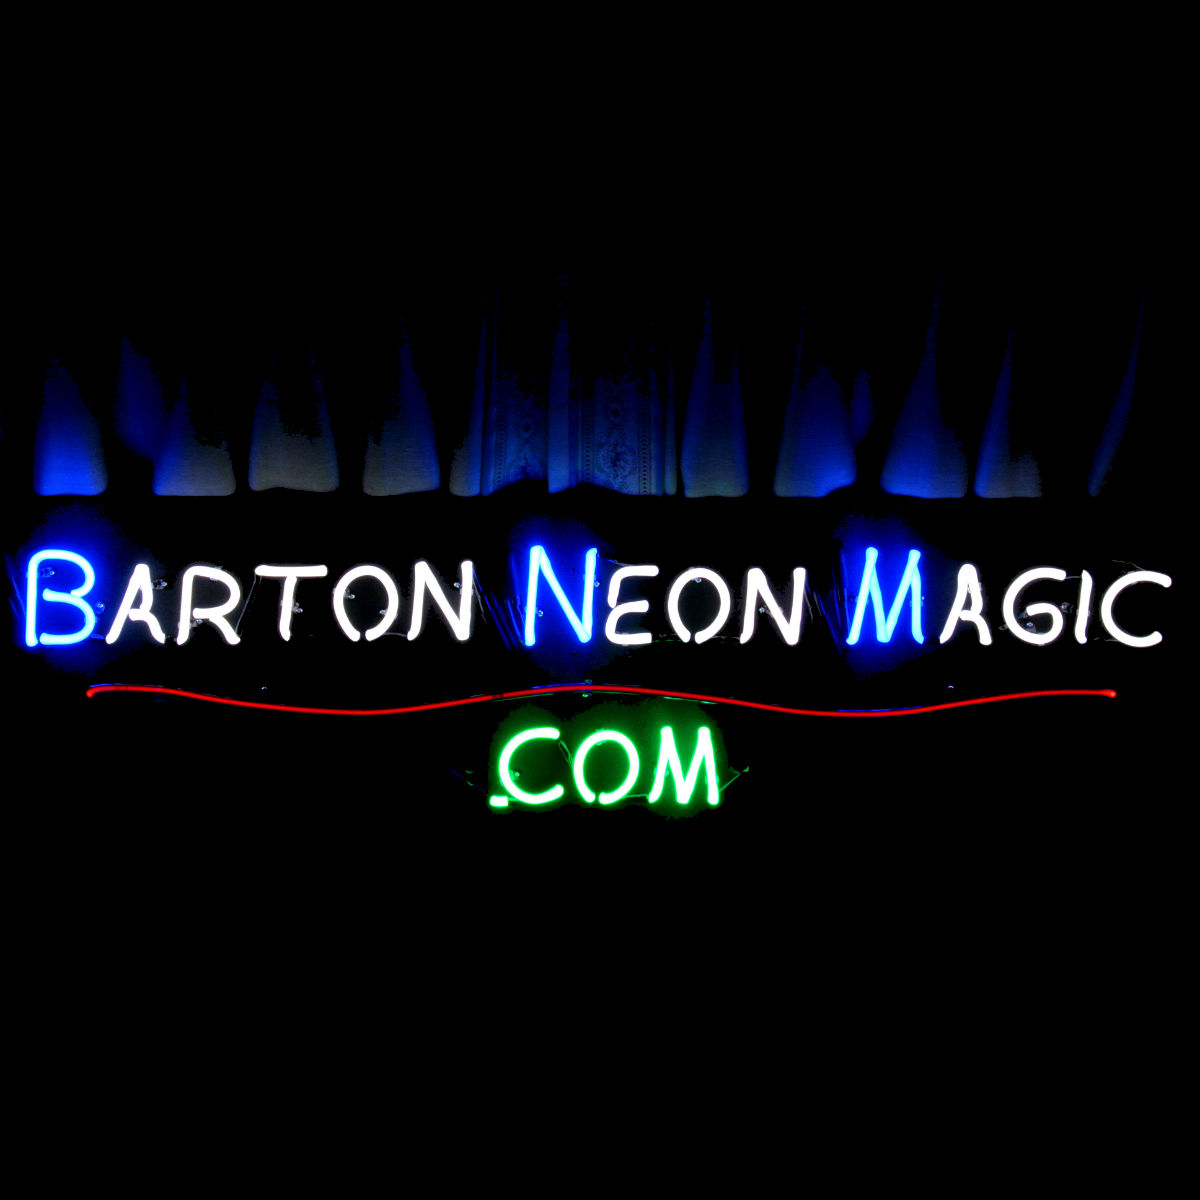 Brilliant custom neon by John Barton - BartonNeonMagic.com